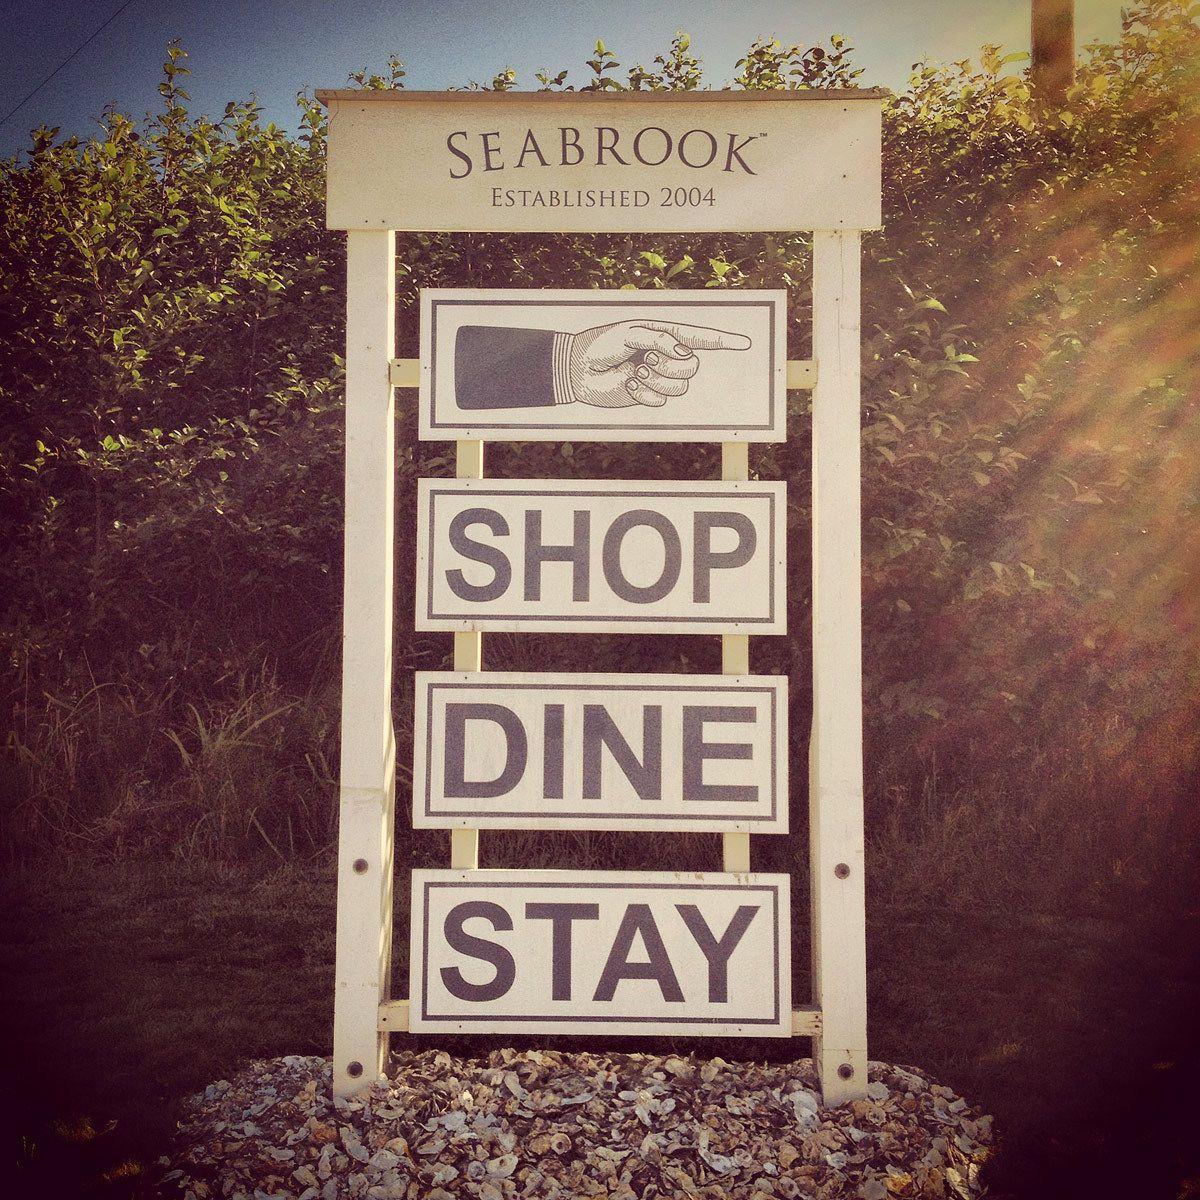 1seabrooke_washington_village_sign.jpg